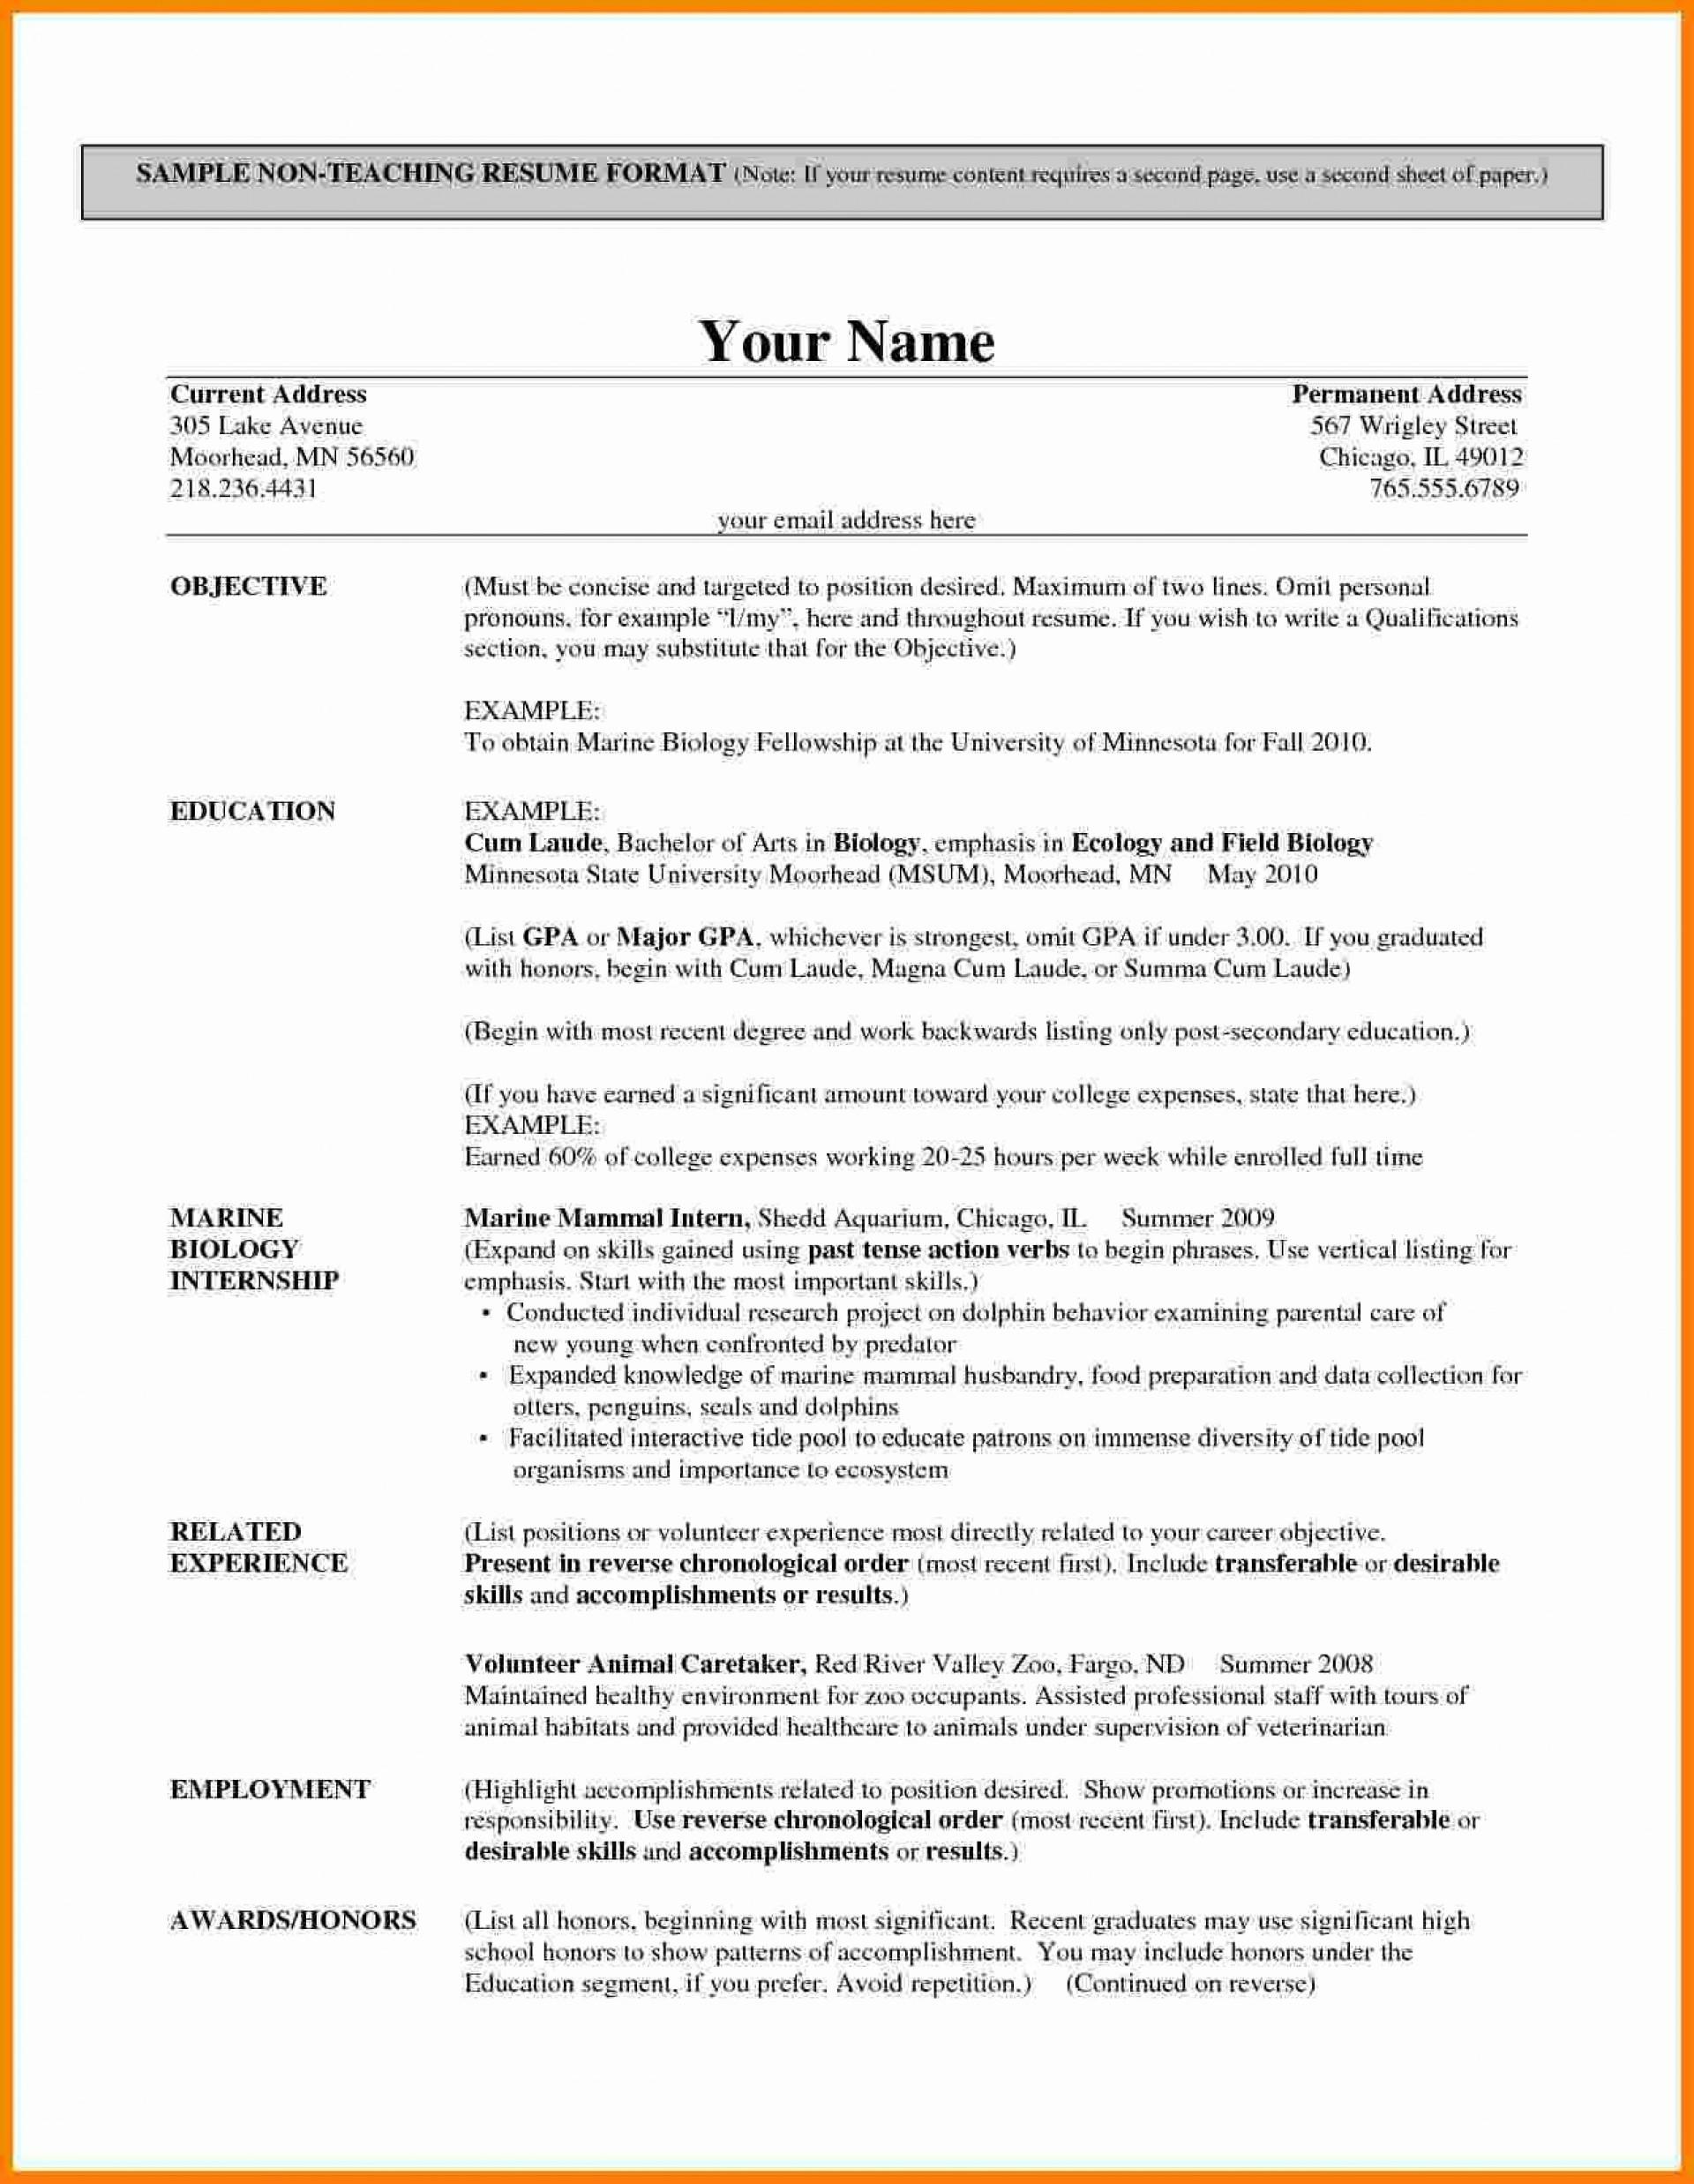 002 Shocking Resume Example For Teacher Job Picture  Sample Cv School1920